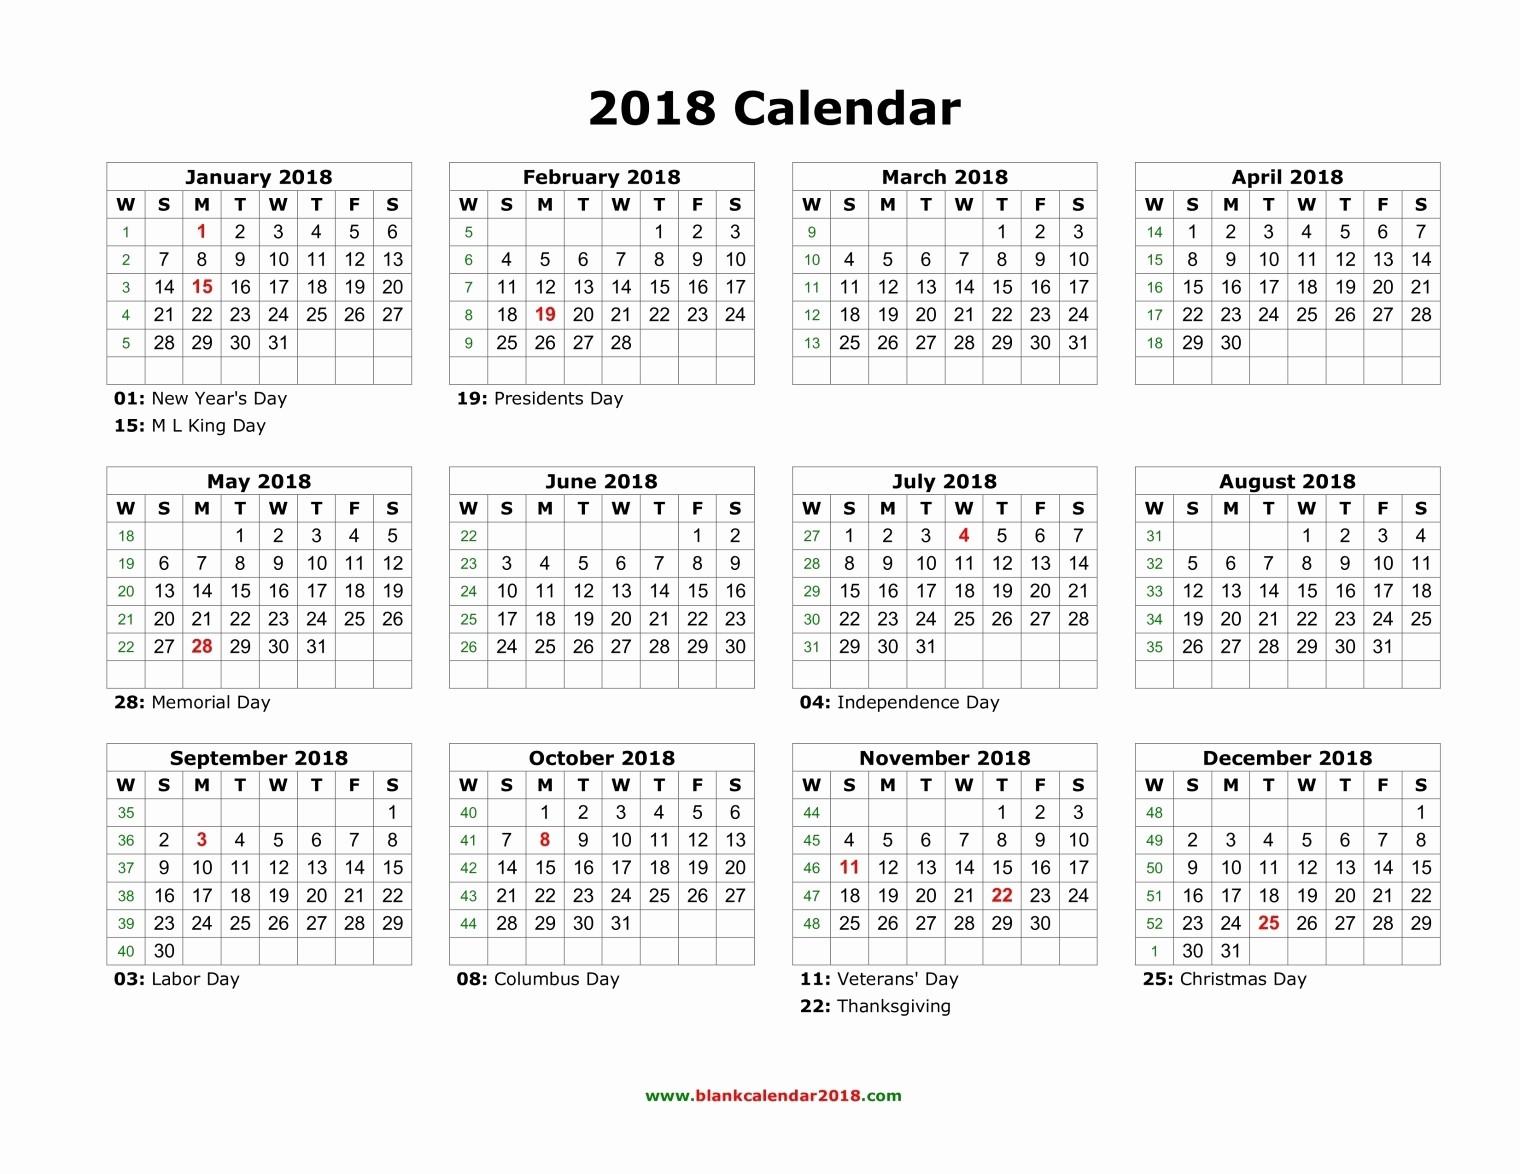 2018 Year Calendar One Page Elegant Blank Holidays Calendar 2018 Landscape